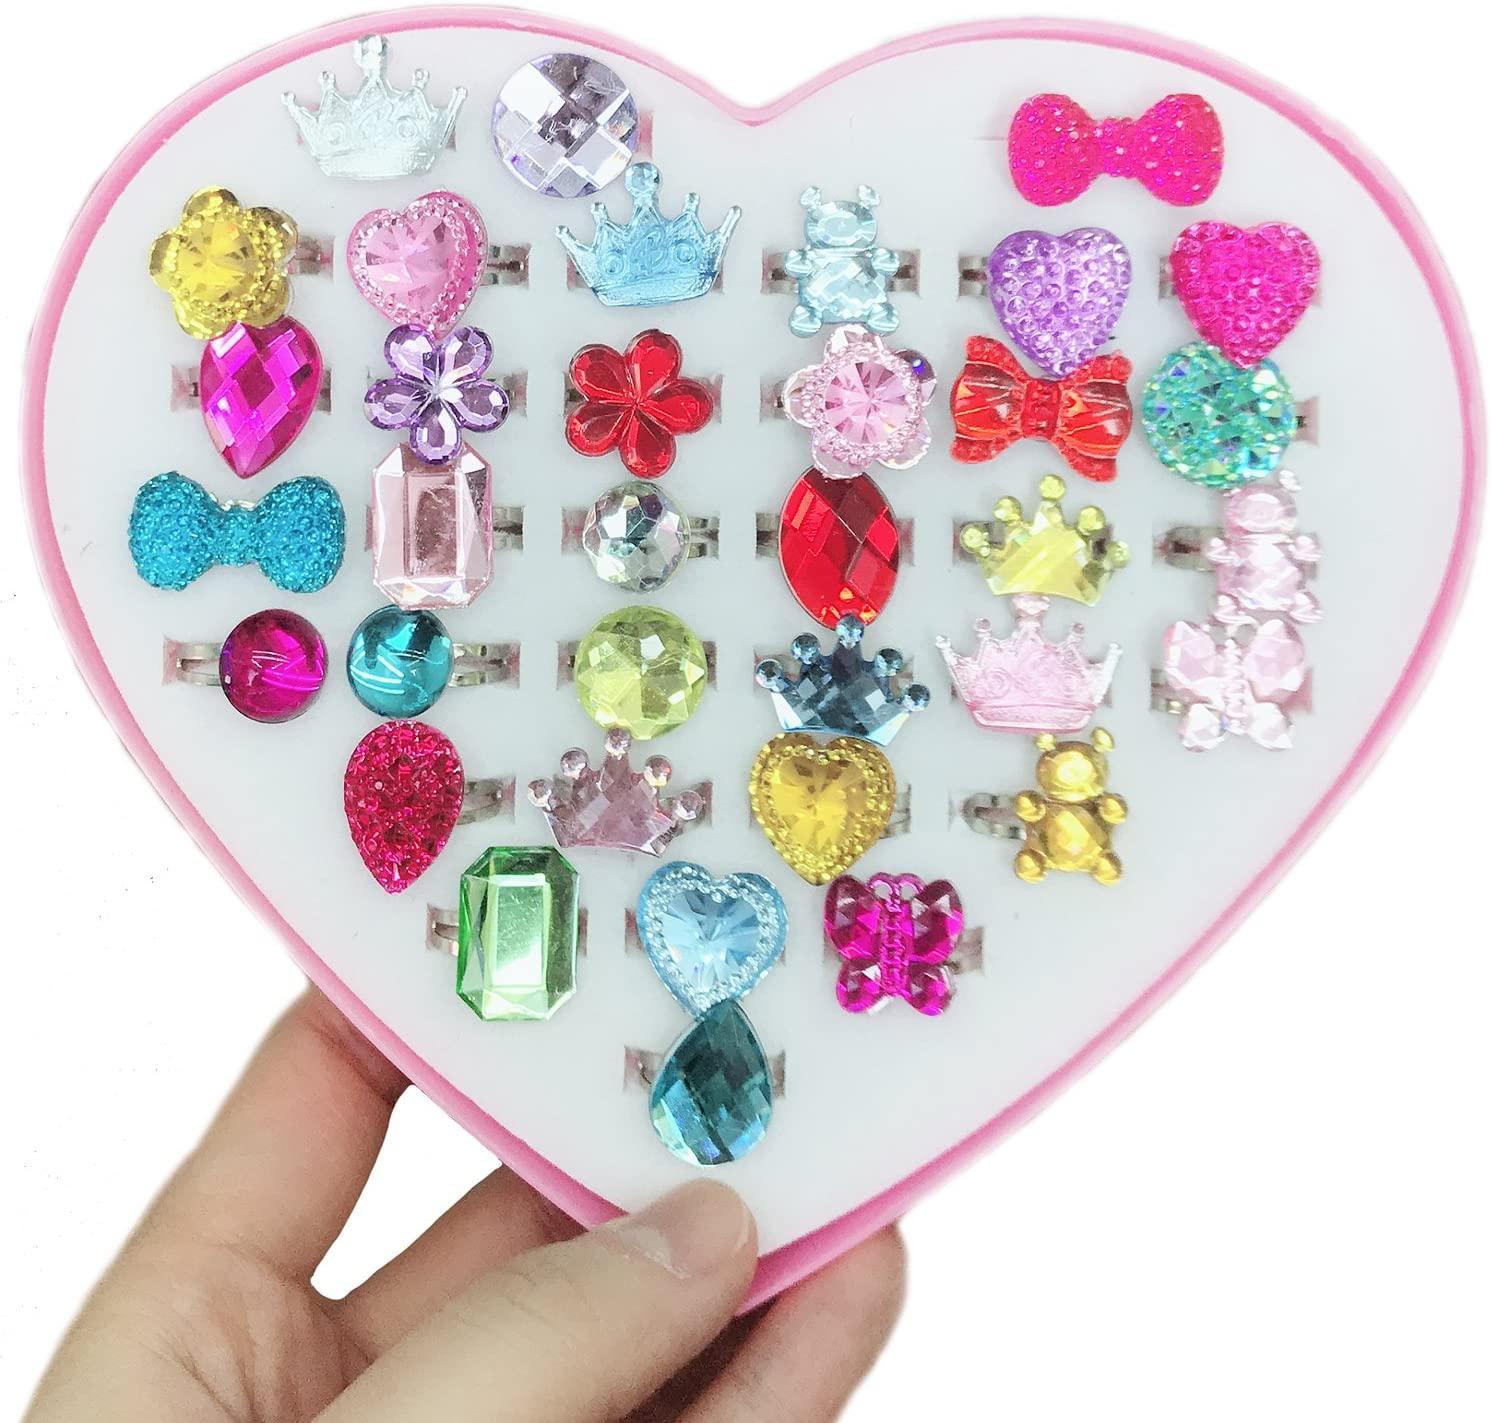 Elesa Miracle 36pcs Kids Girl Adjustable Jewelry Rings, Girl Rhinestone Diamond Rings Pretend Play and Dress up Toy Rings